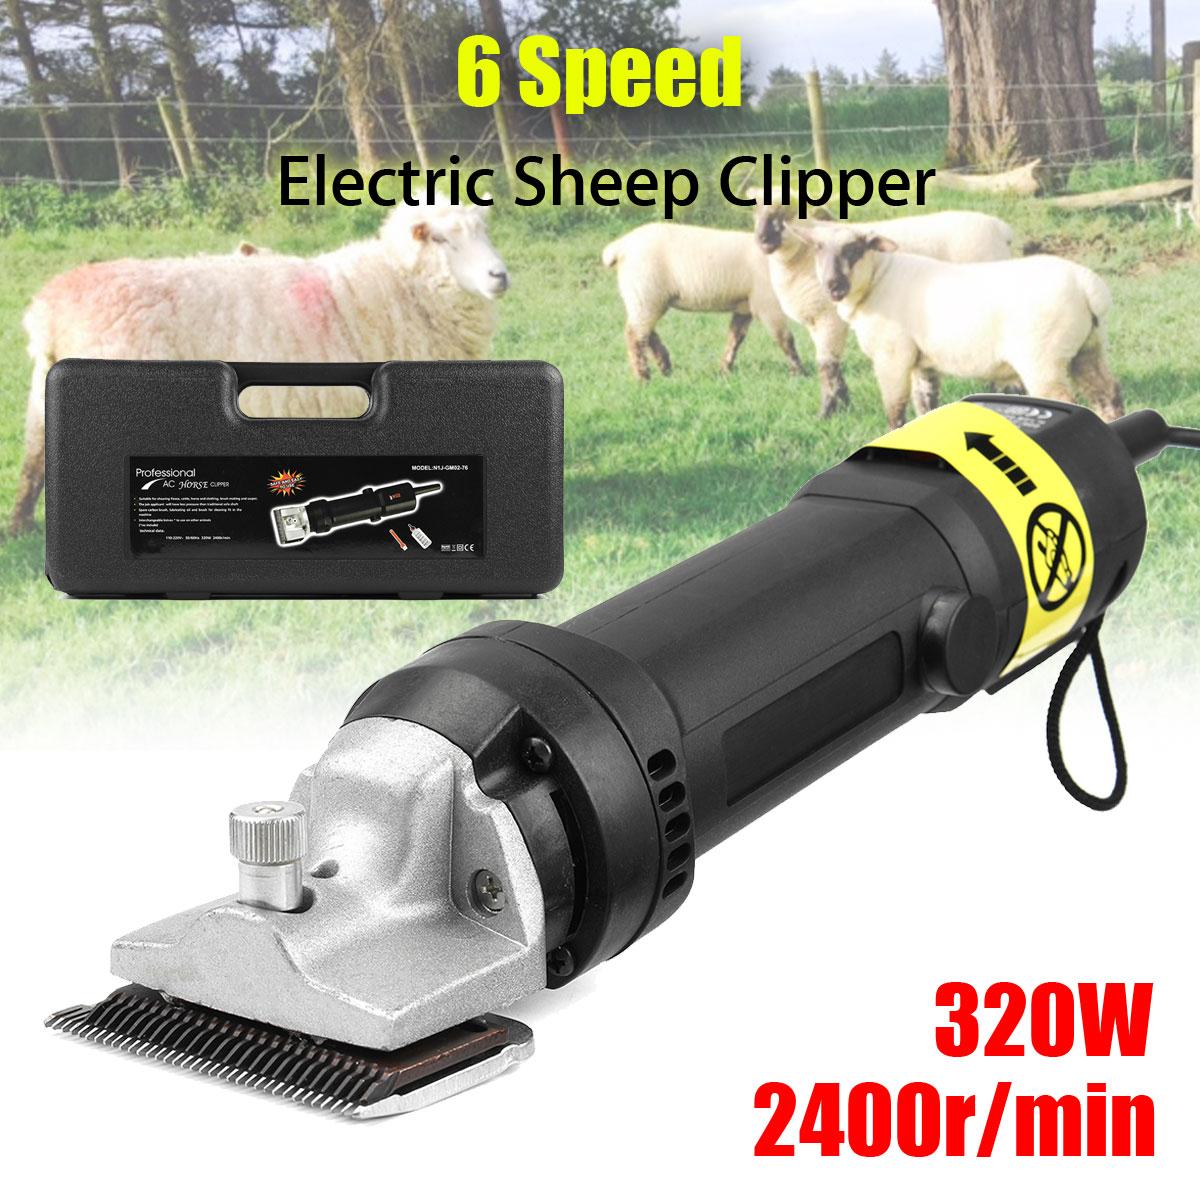 Professional Sheep Goat Clipper Kit Electric Shearing Machine 110V USA//CANADA